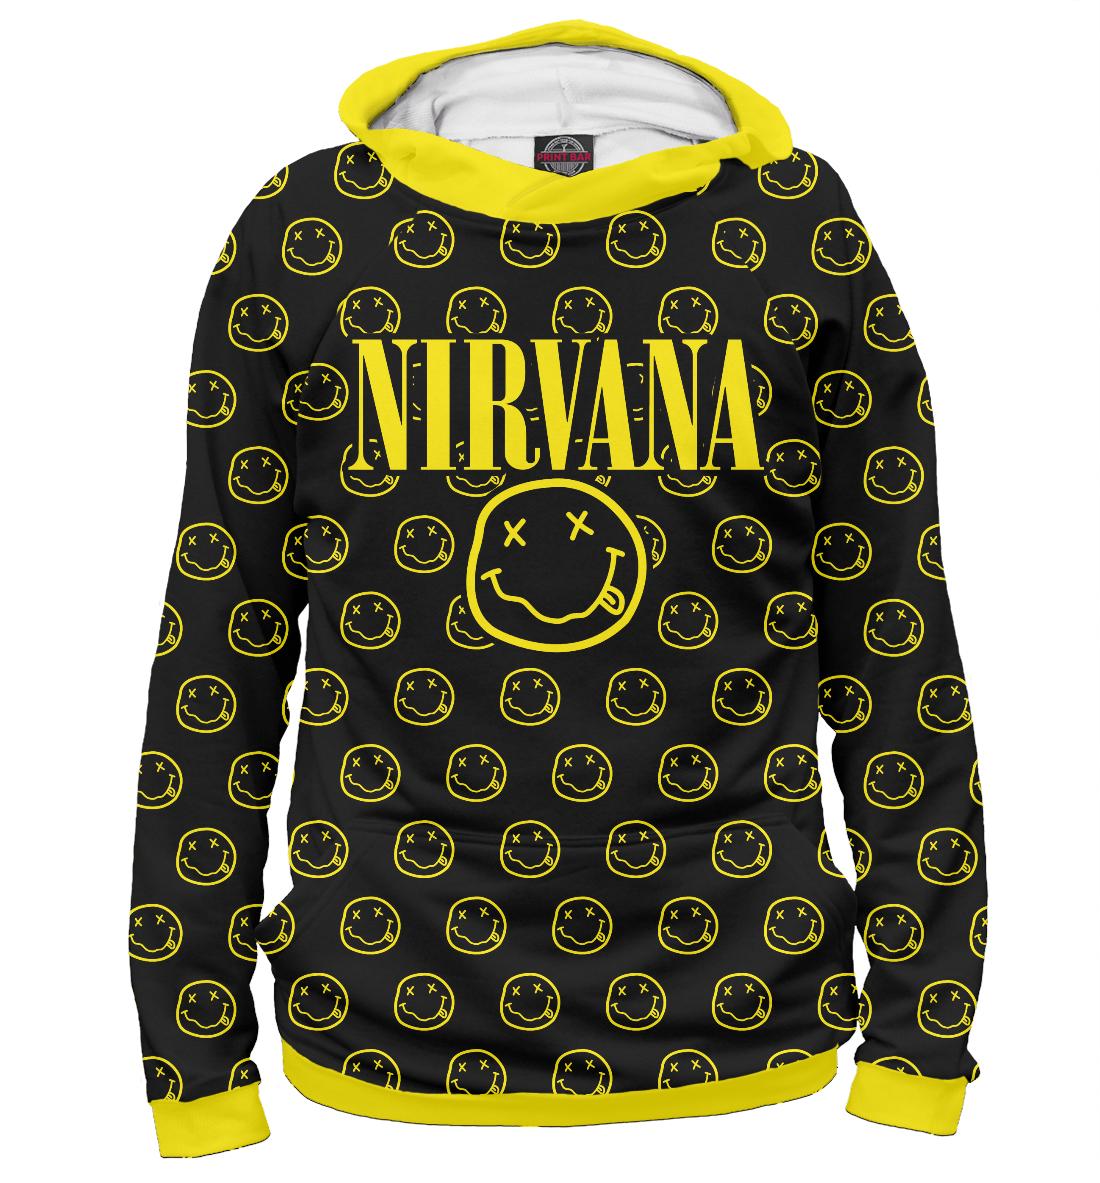 Купить Nirvana Forever, Printbar, Худи, NIR-826108-hud-1